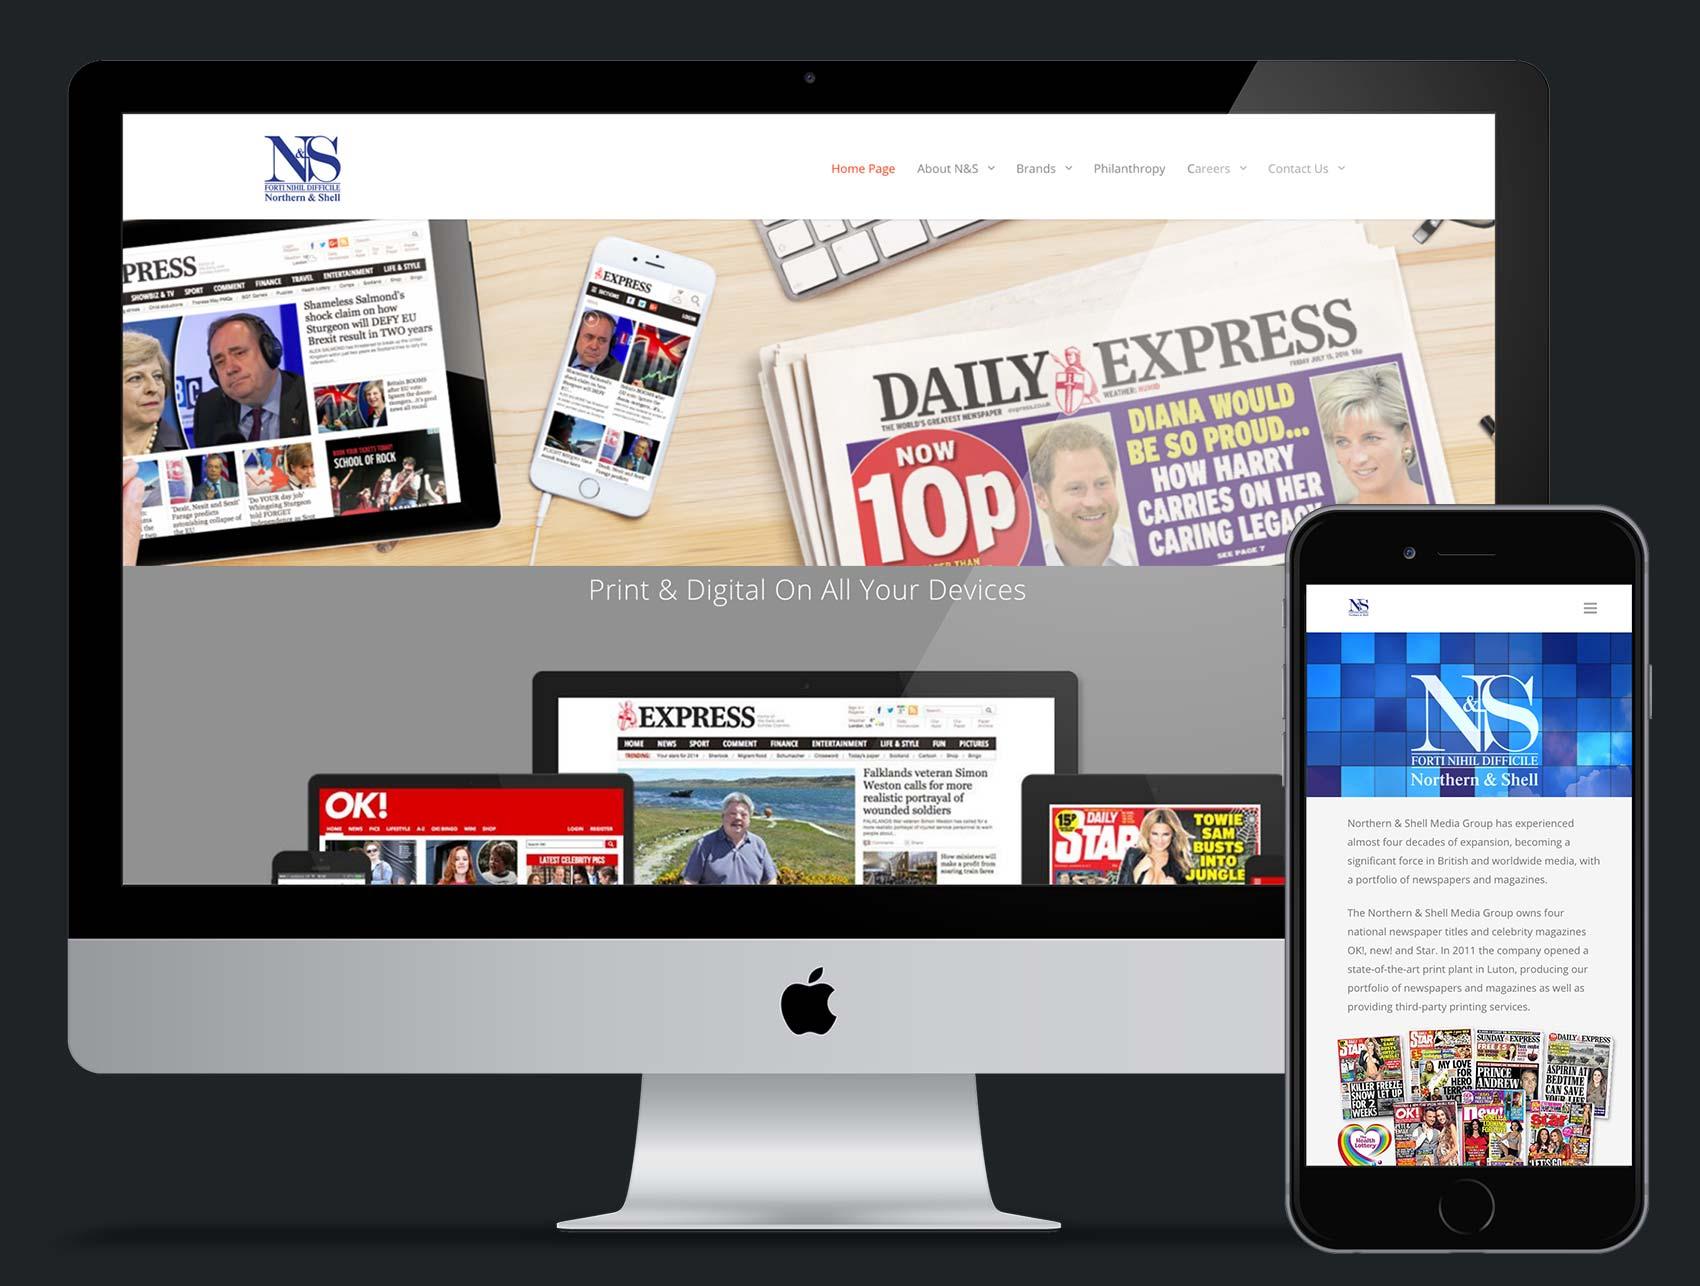 Northern & Shell website design and build using Wordpress platform